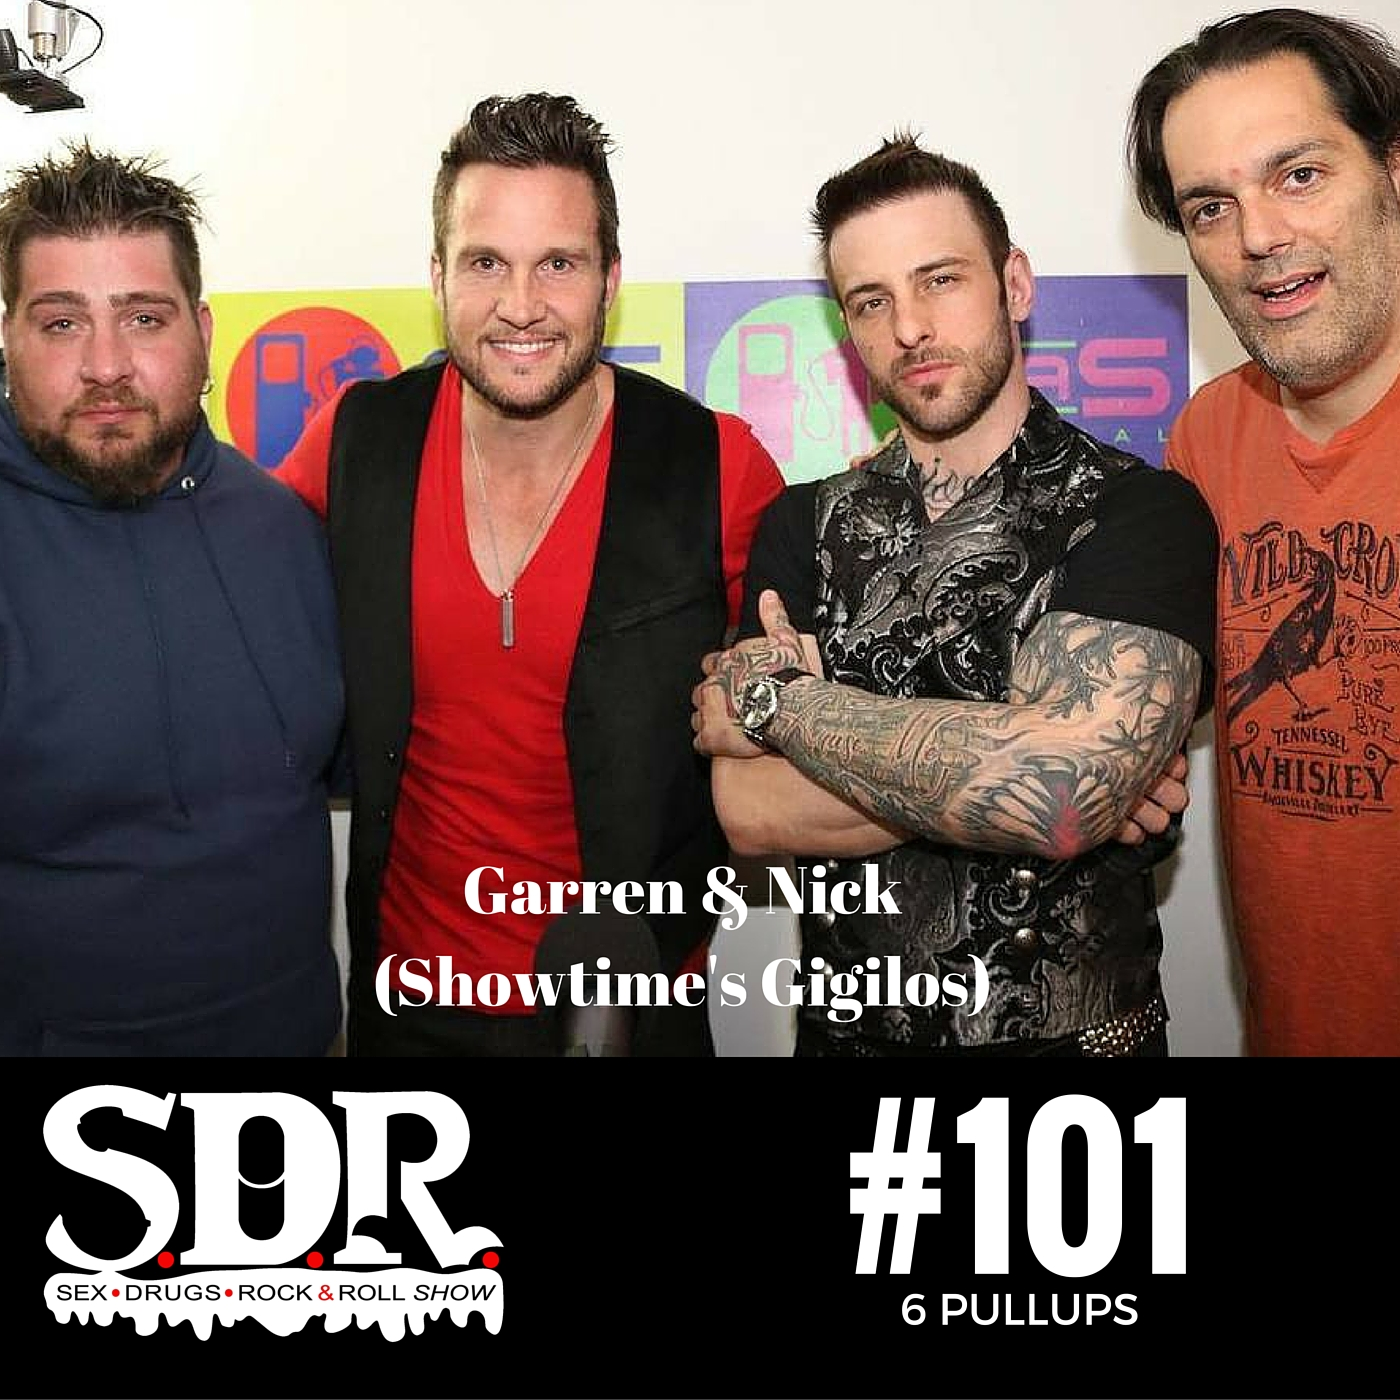 SDR 101 - Nick Hawk & Garren James (Showtime's Gigilos)